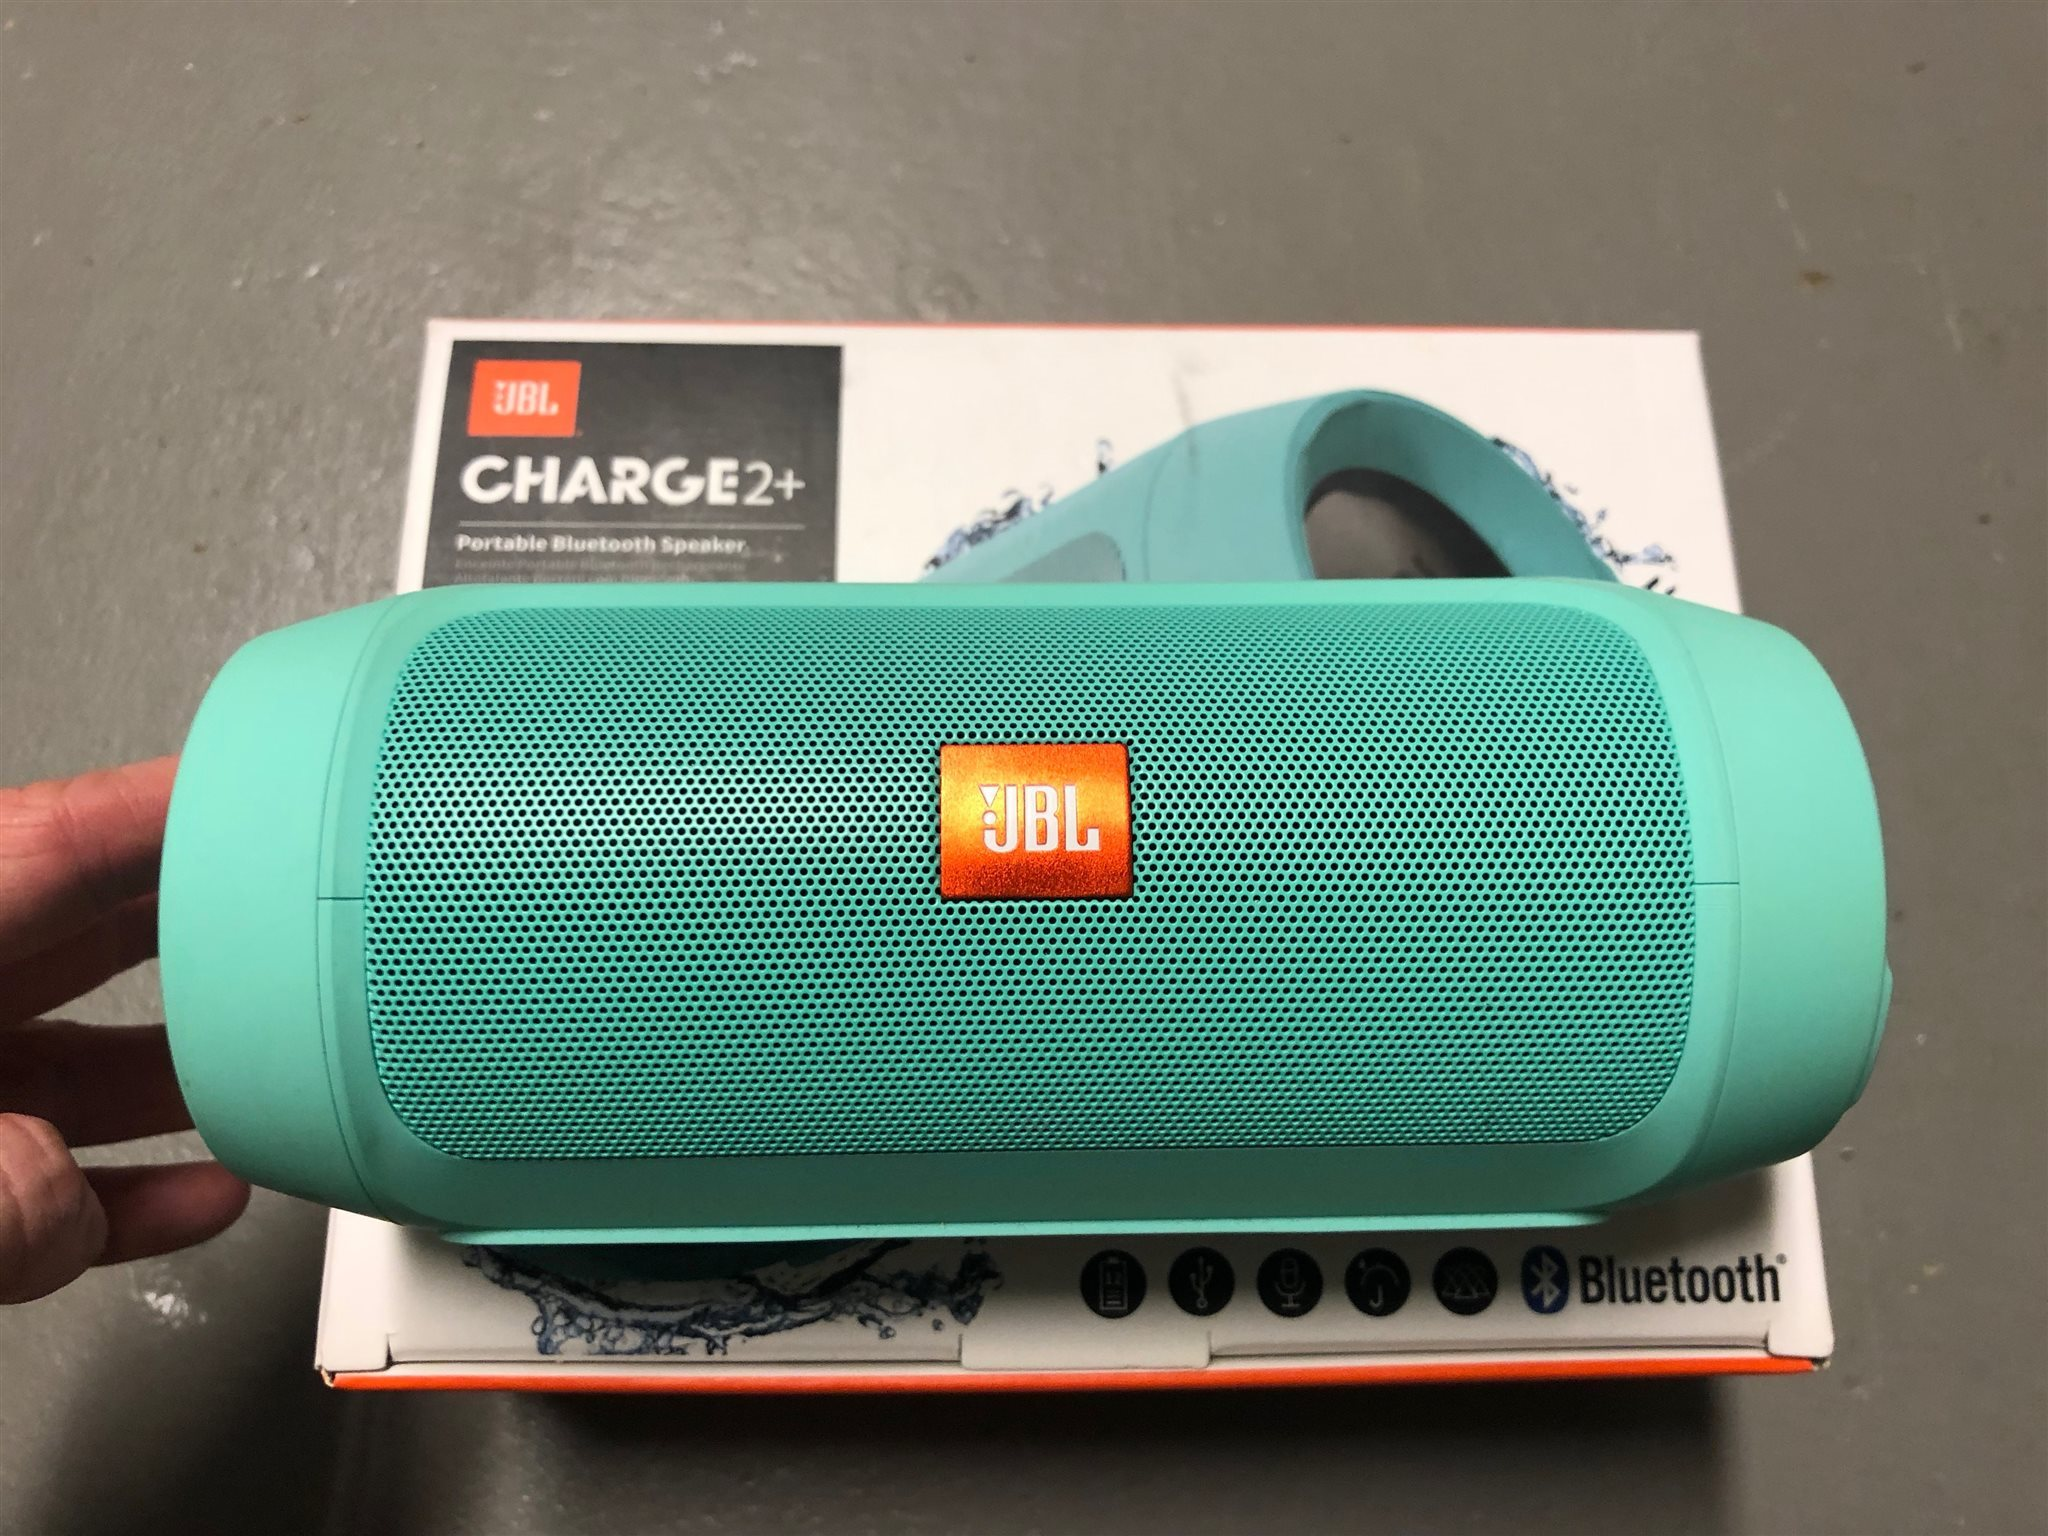 JBL Charge 2+ bluetooth högtalare (337220296) ᐈ Köp på Tradera 03fa52f56804a